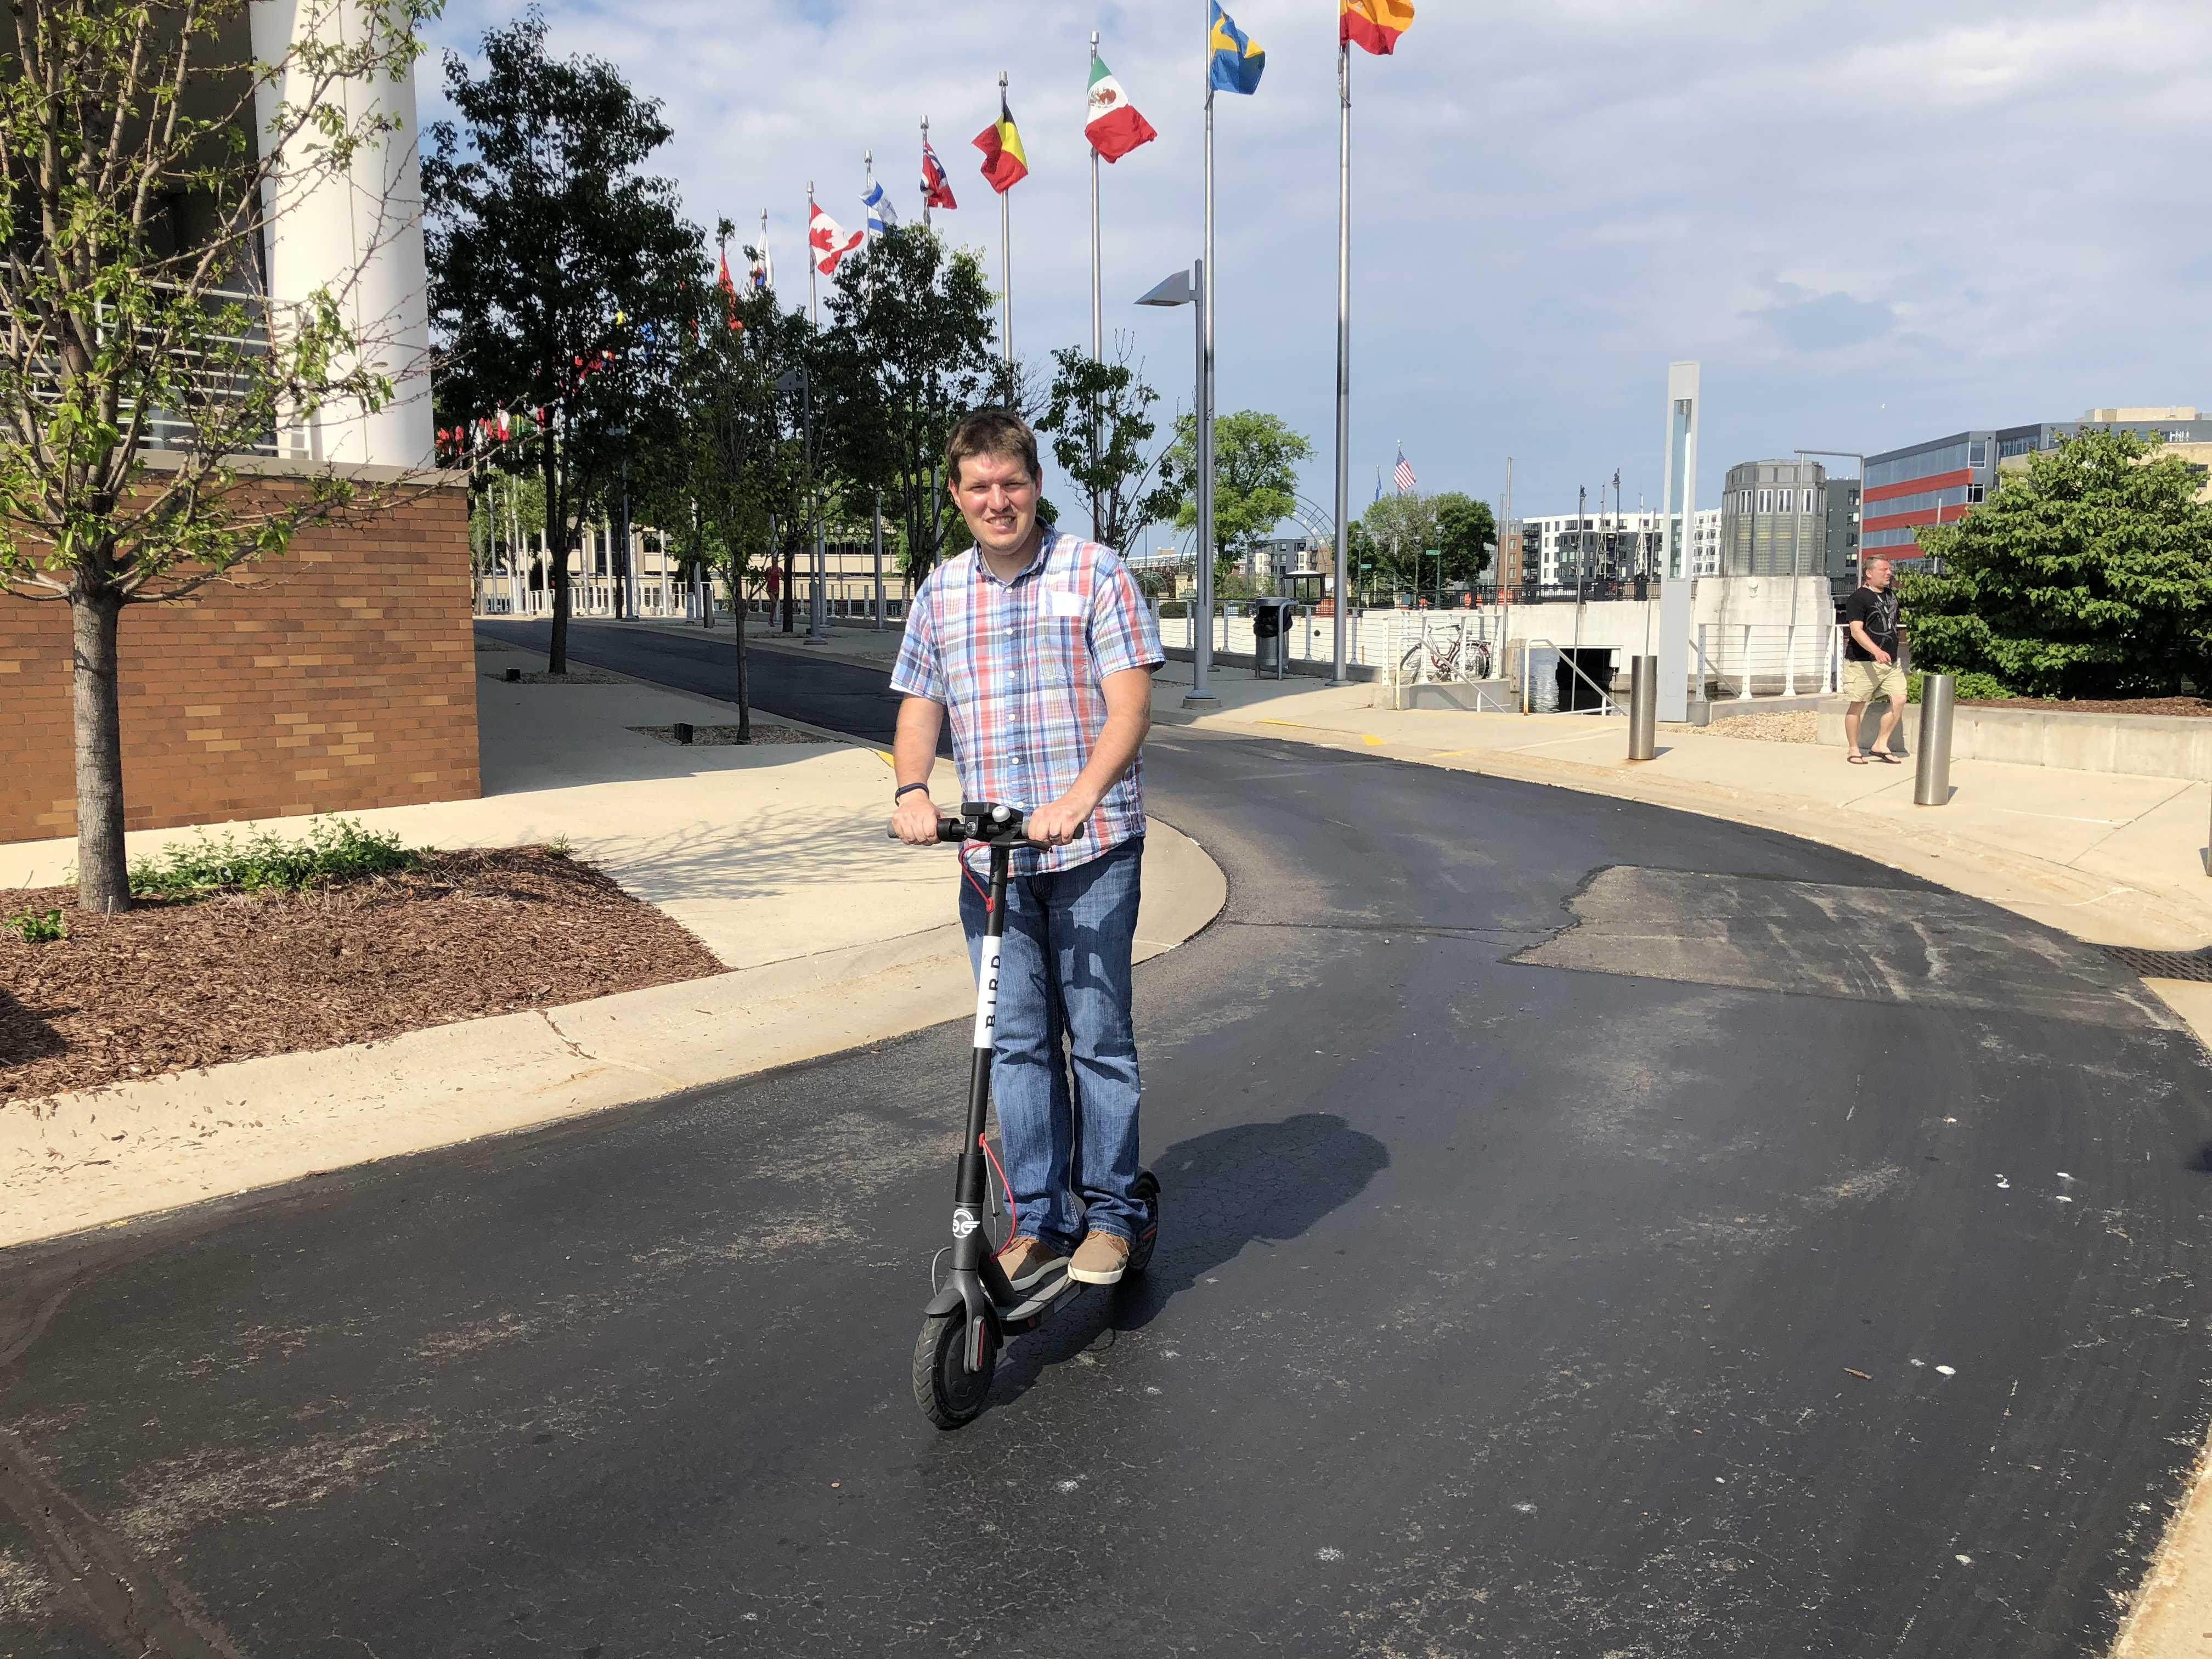 Eyes on Milwaukee: Dockless Scooters Are Illegal » Urban Milwaukee